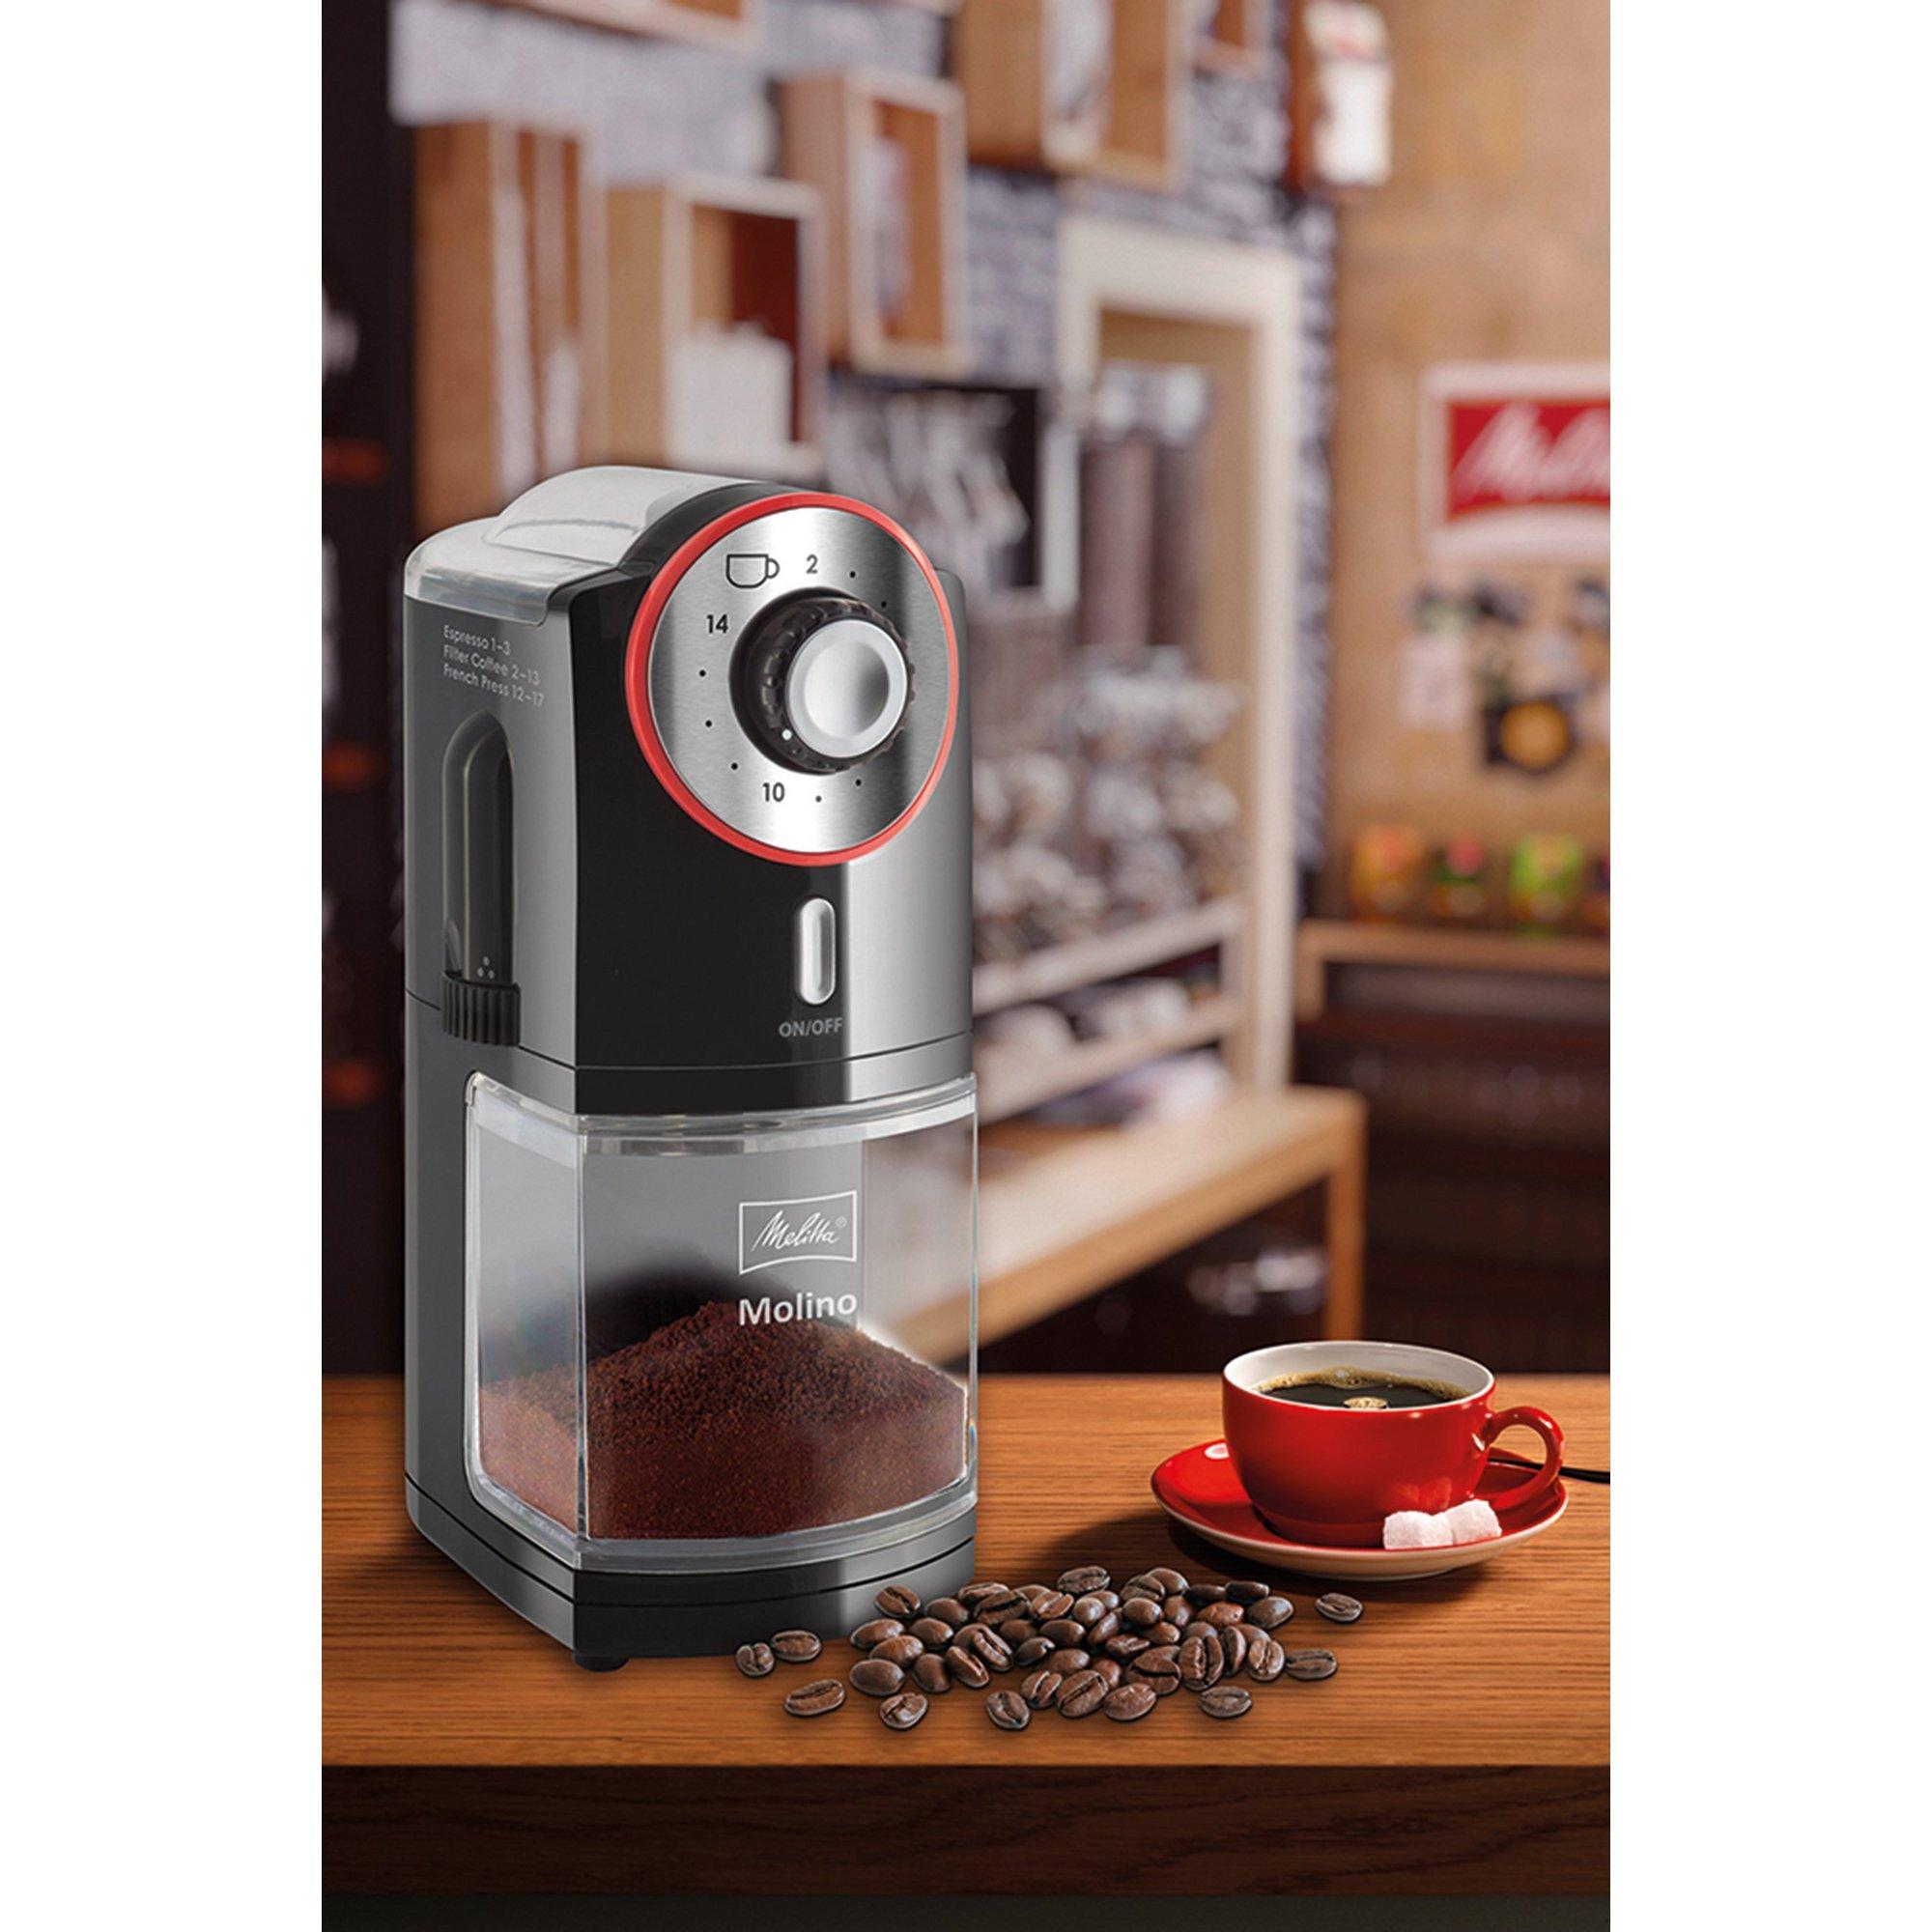 Image of Melitta Molino Electric Coffee Grinder